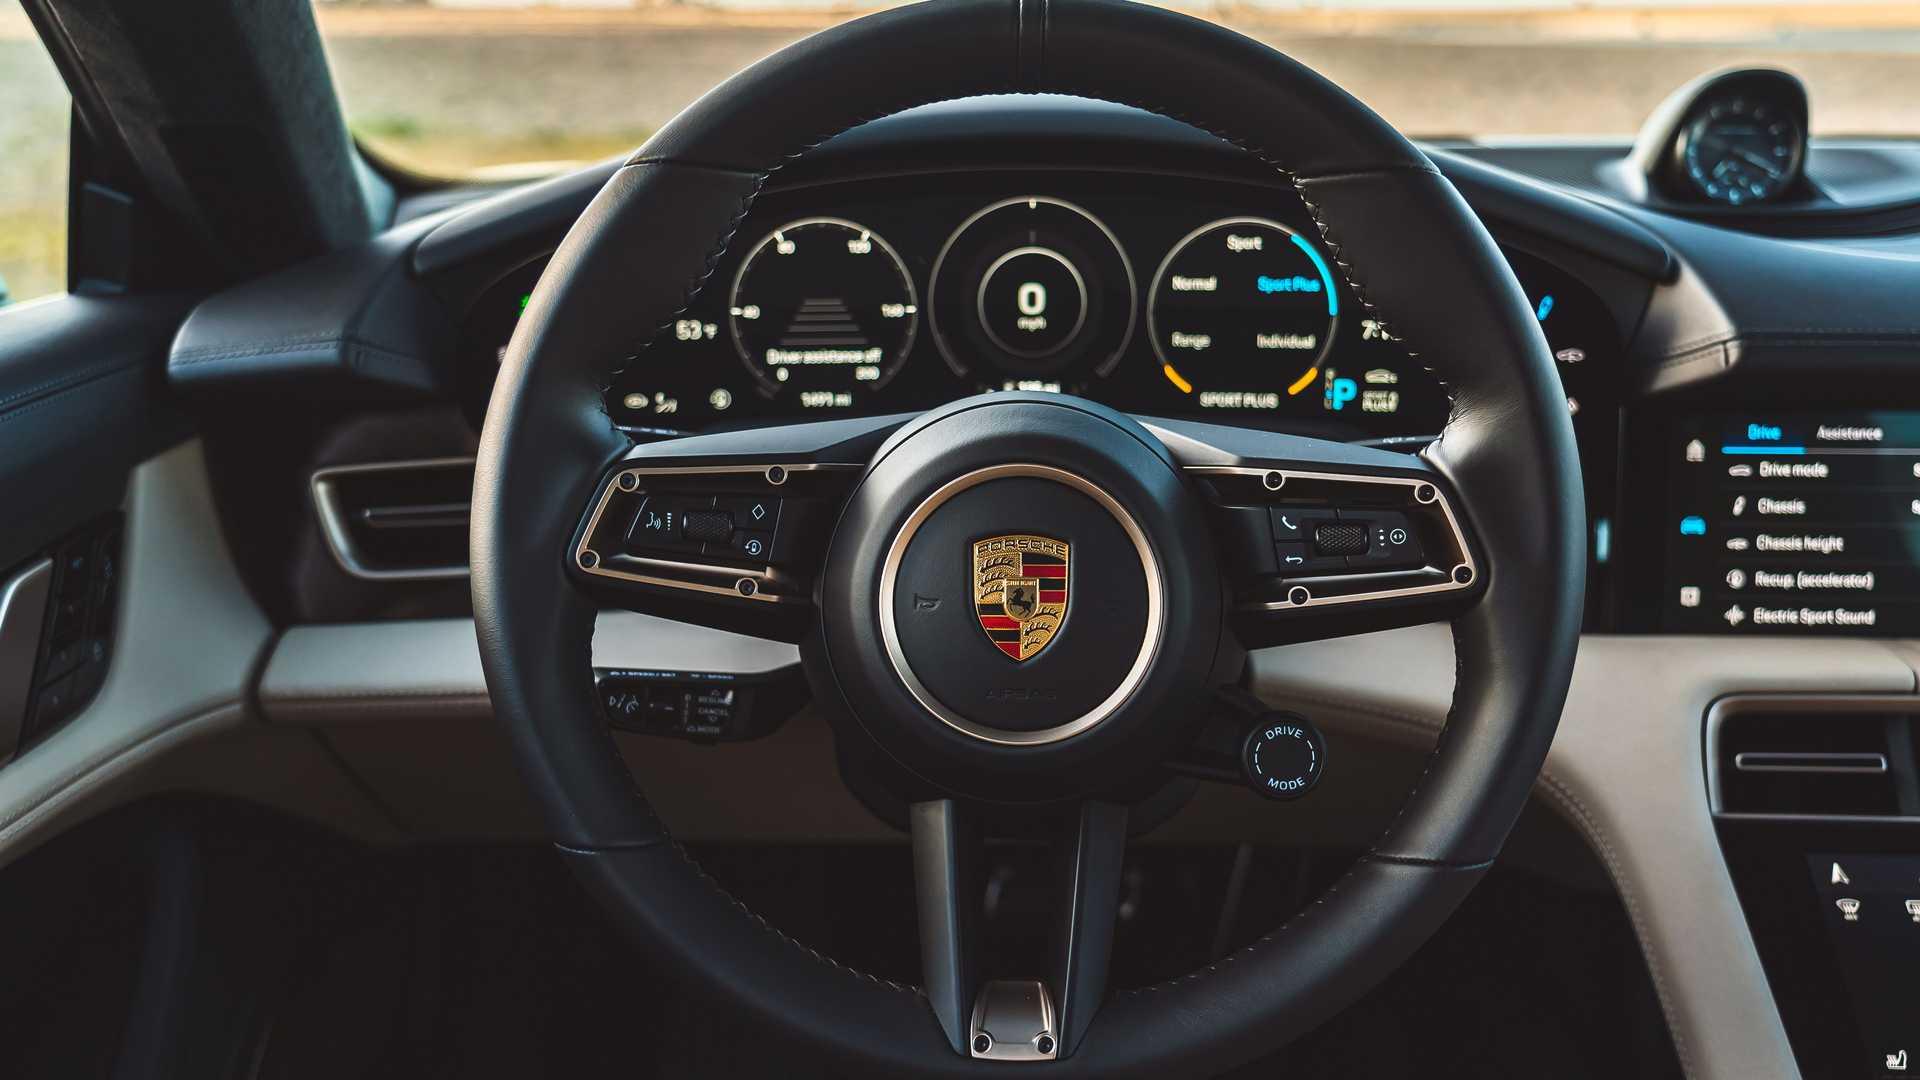 2021 porsche taycan turbo cross turismo interior steering wheel